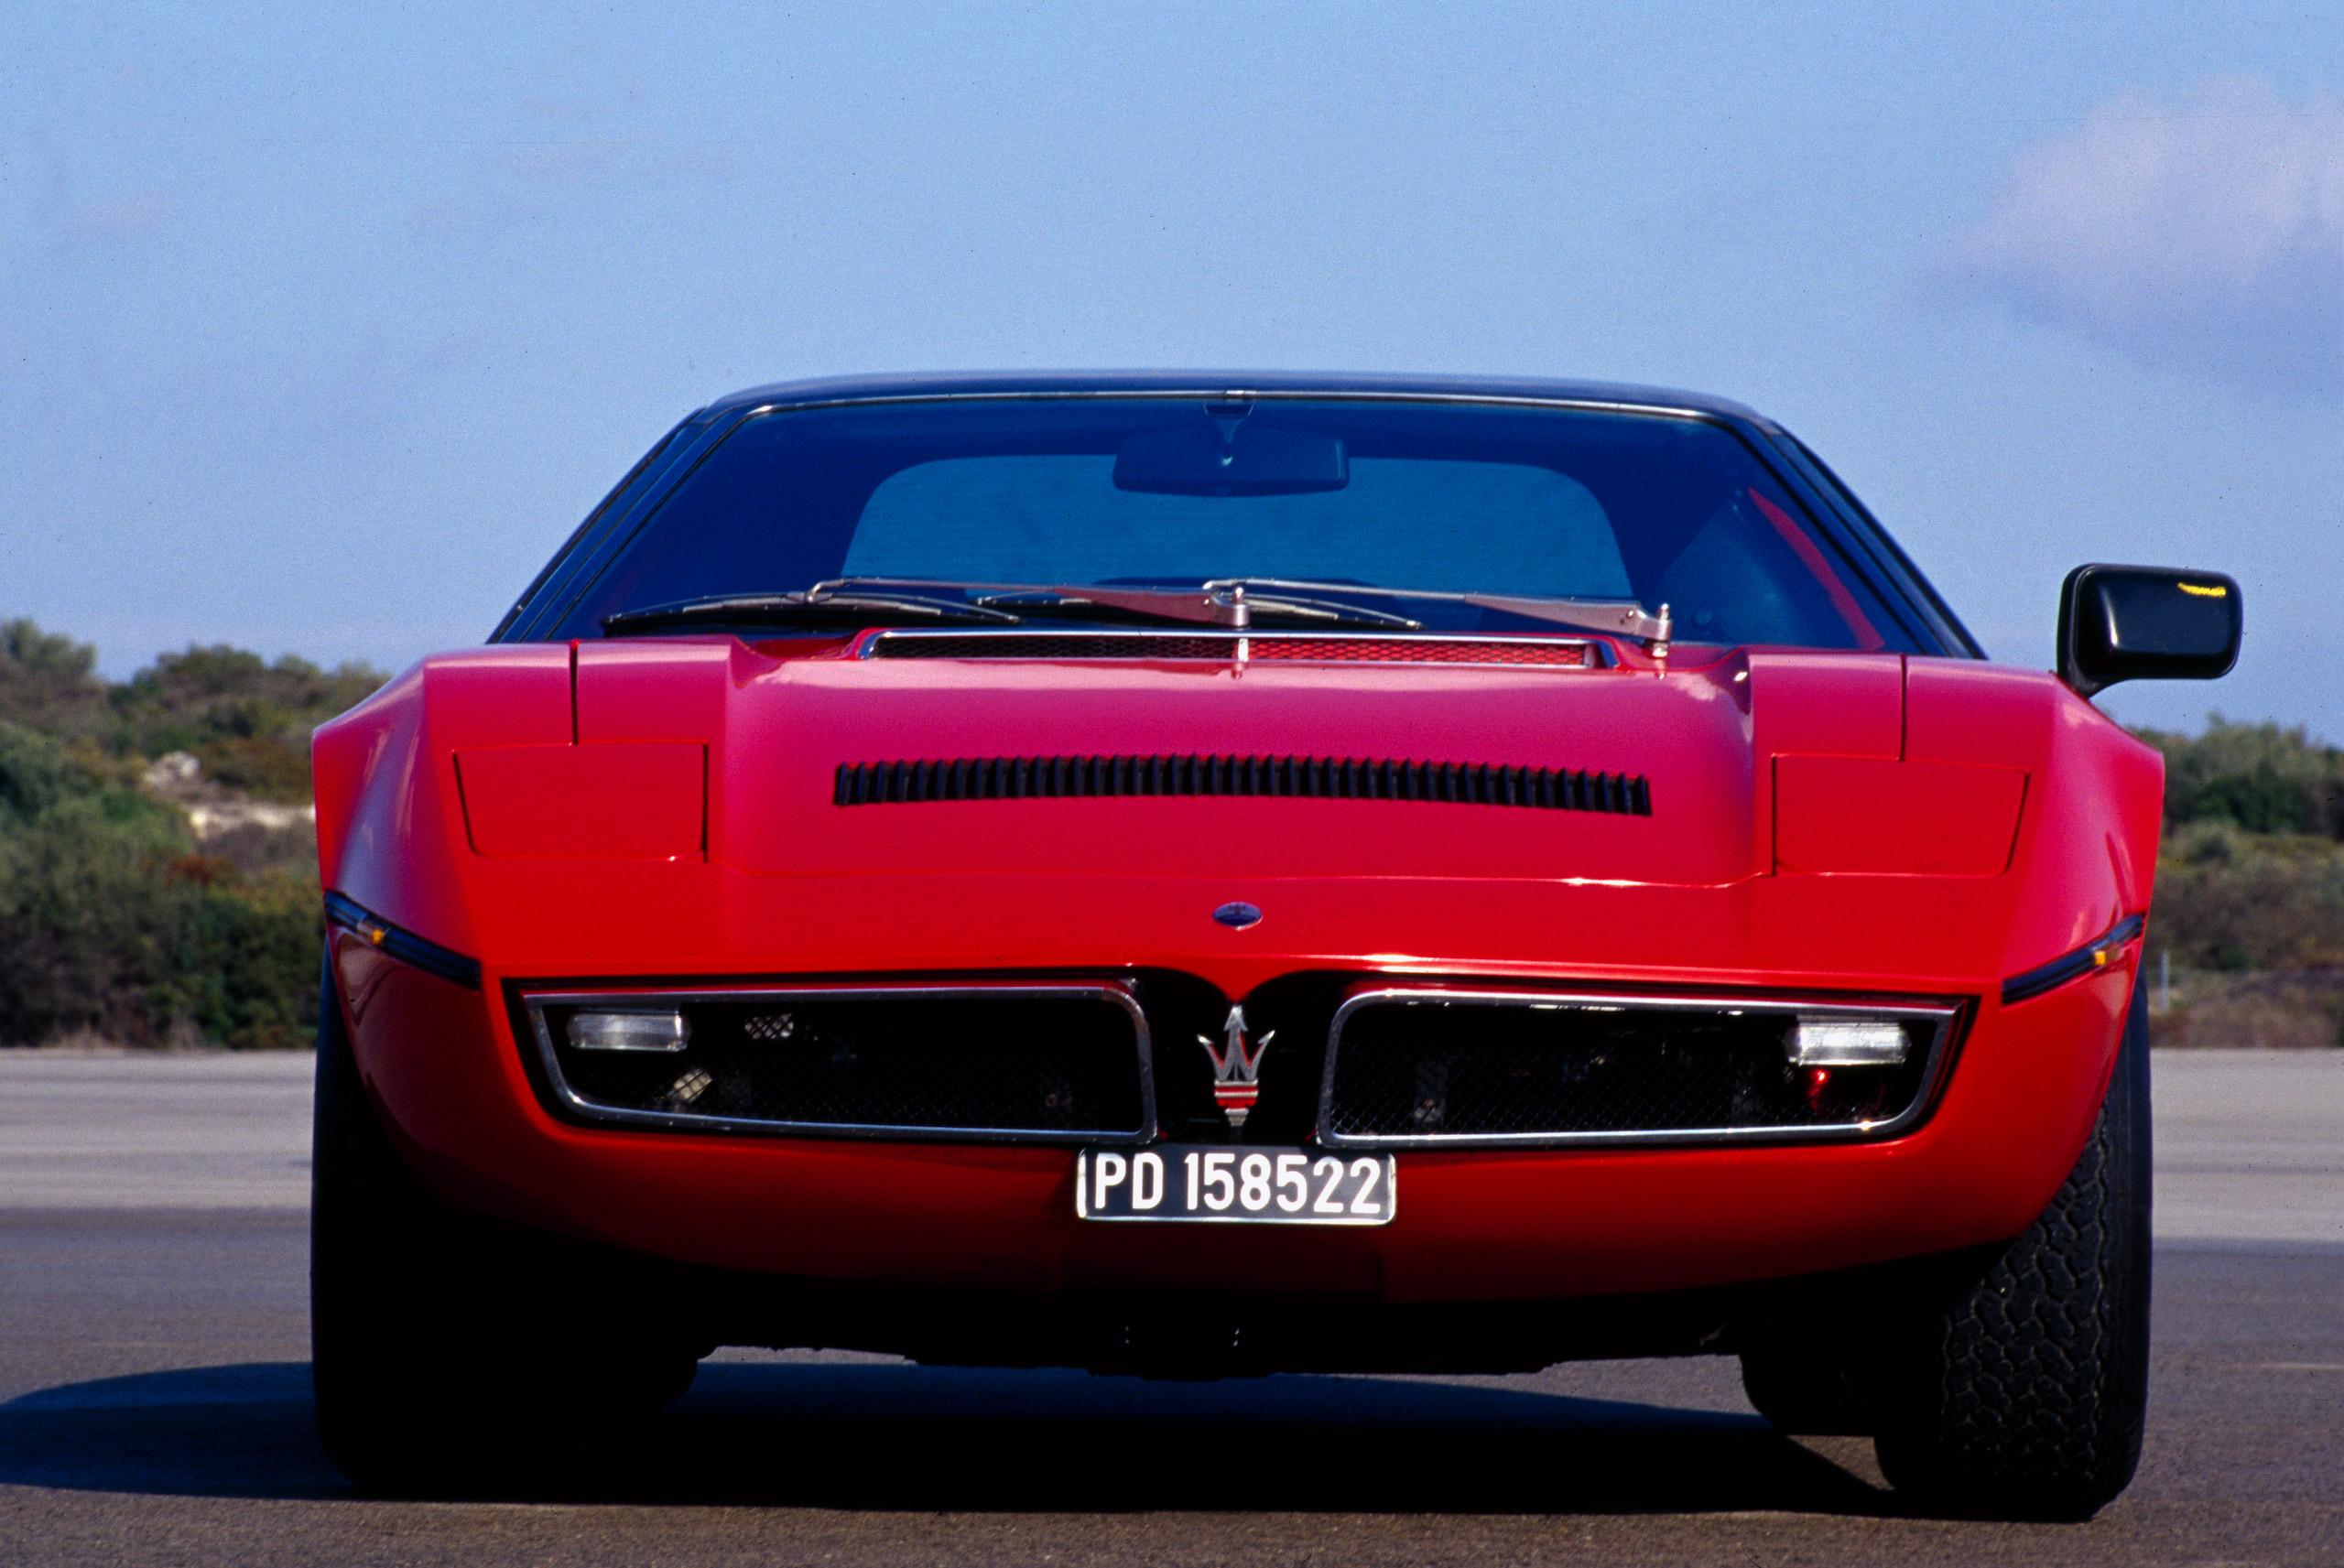 Maserati Bora front